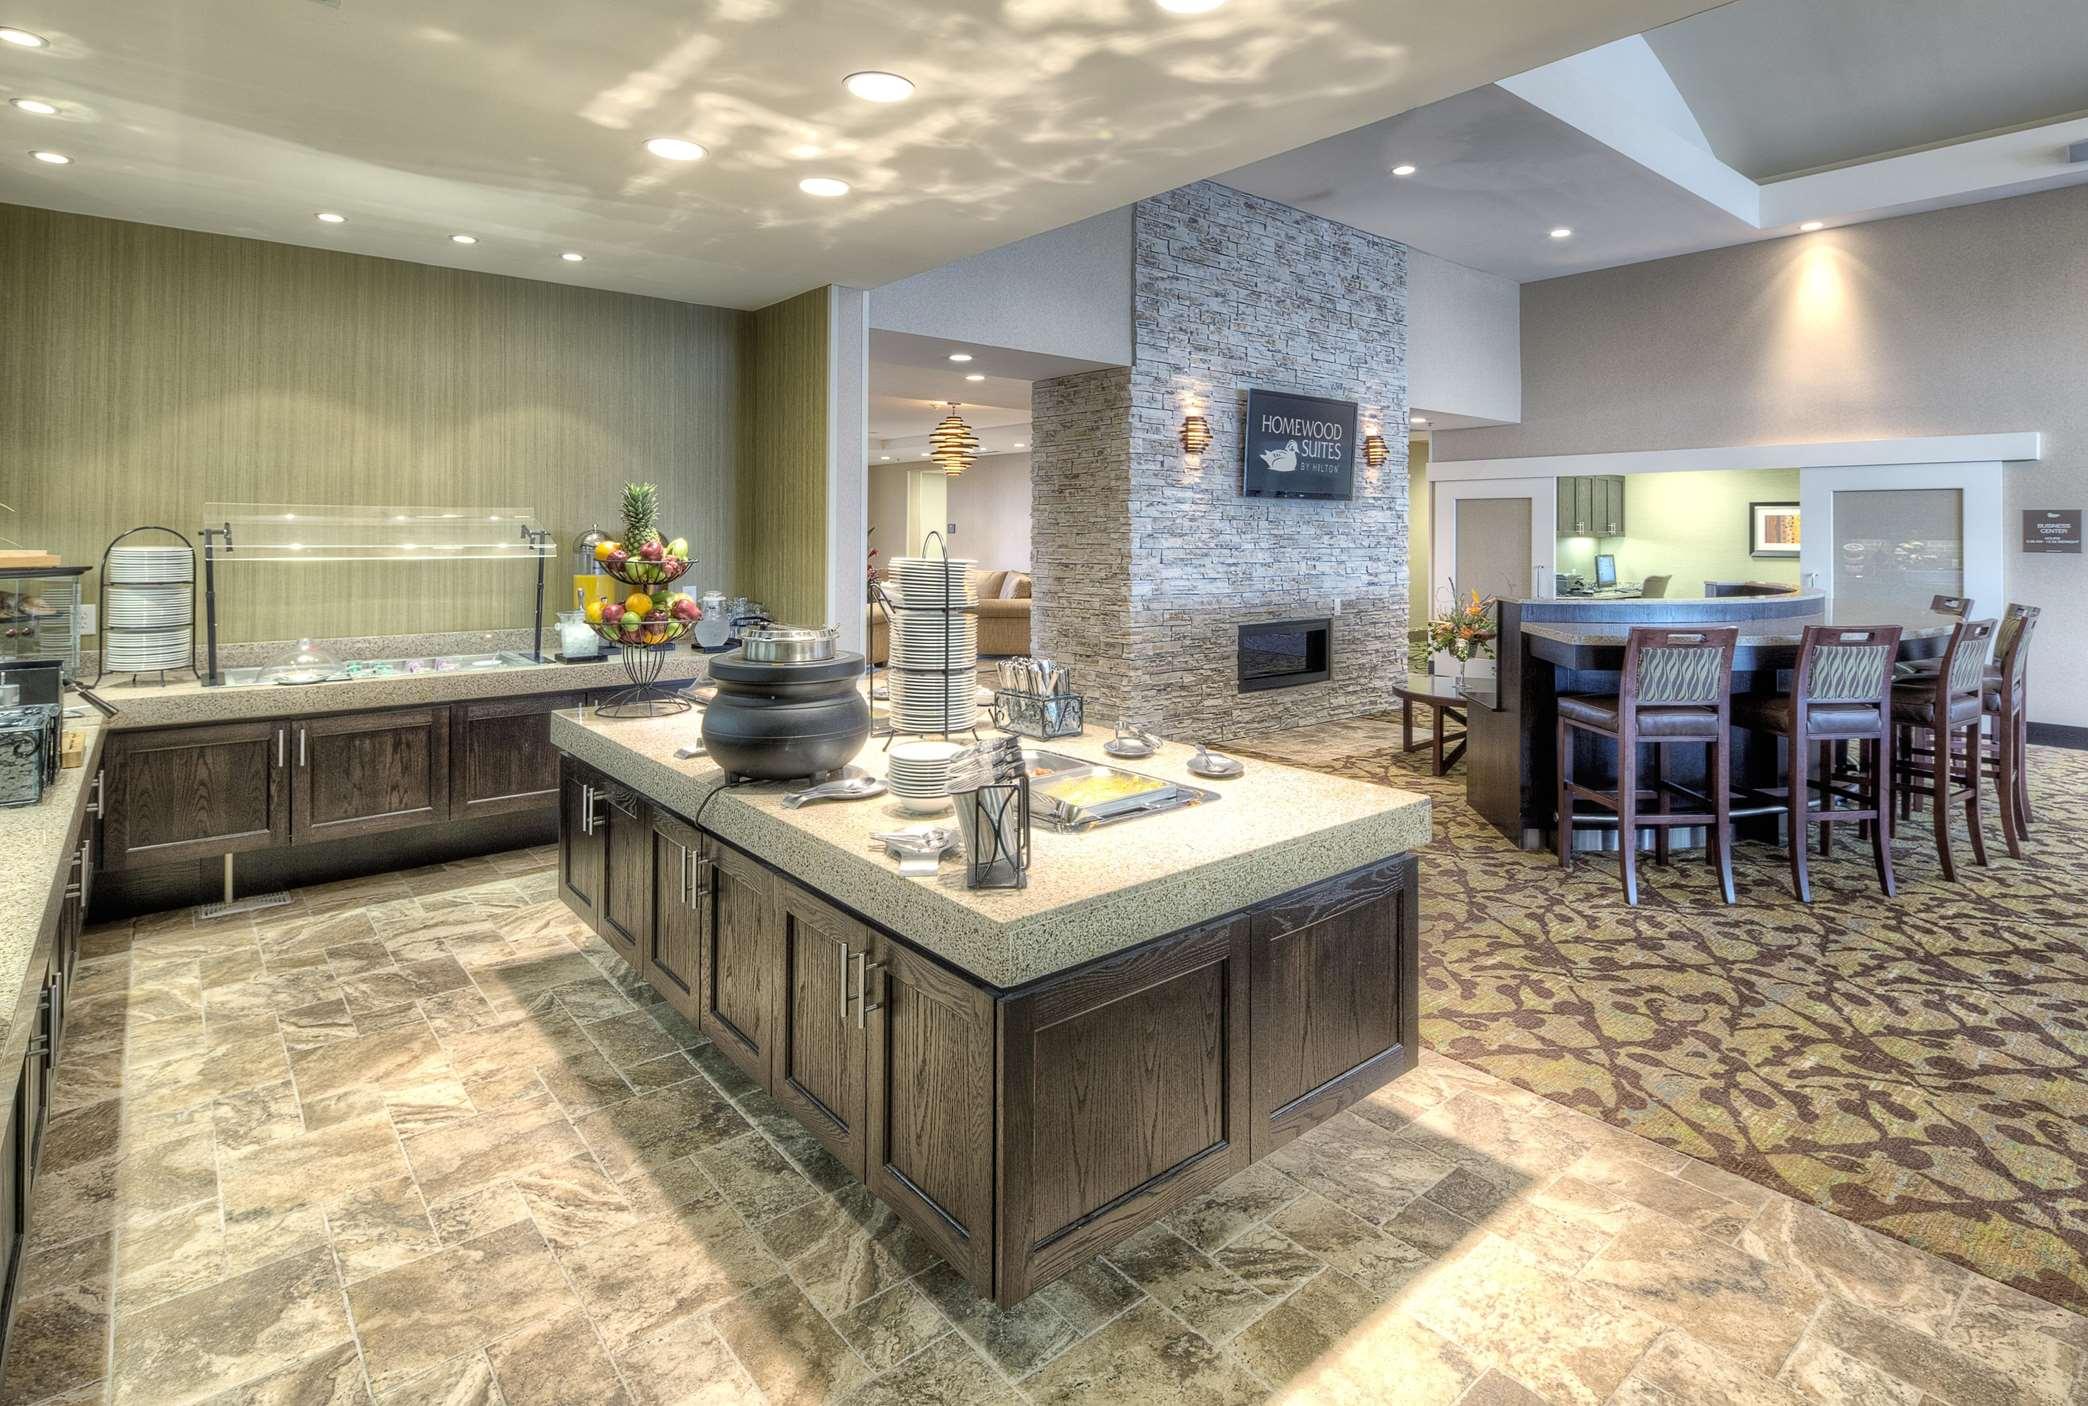 Homewood Suites by Hilton Victoria, TX image 10